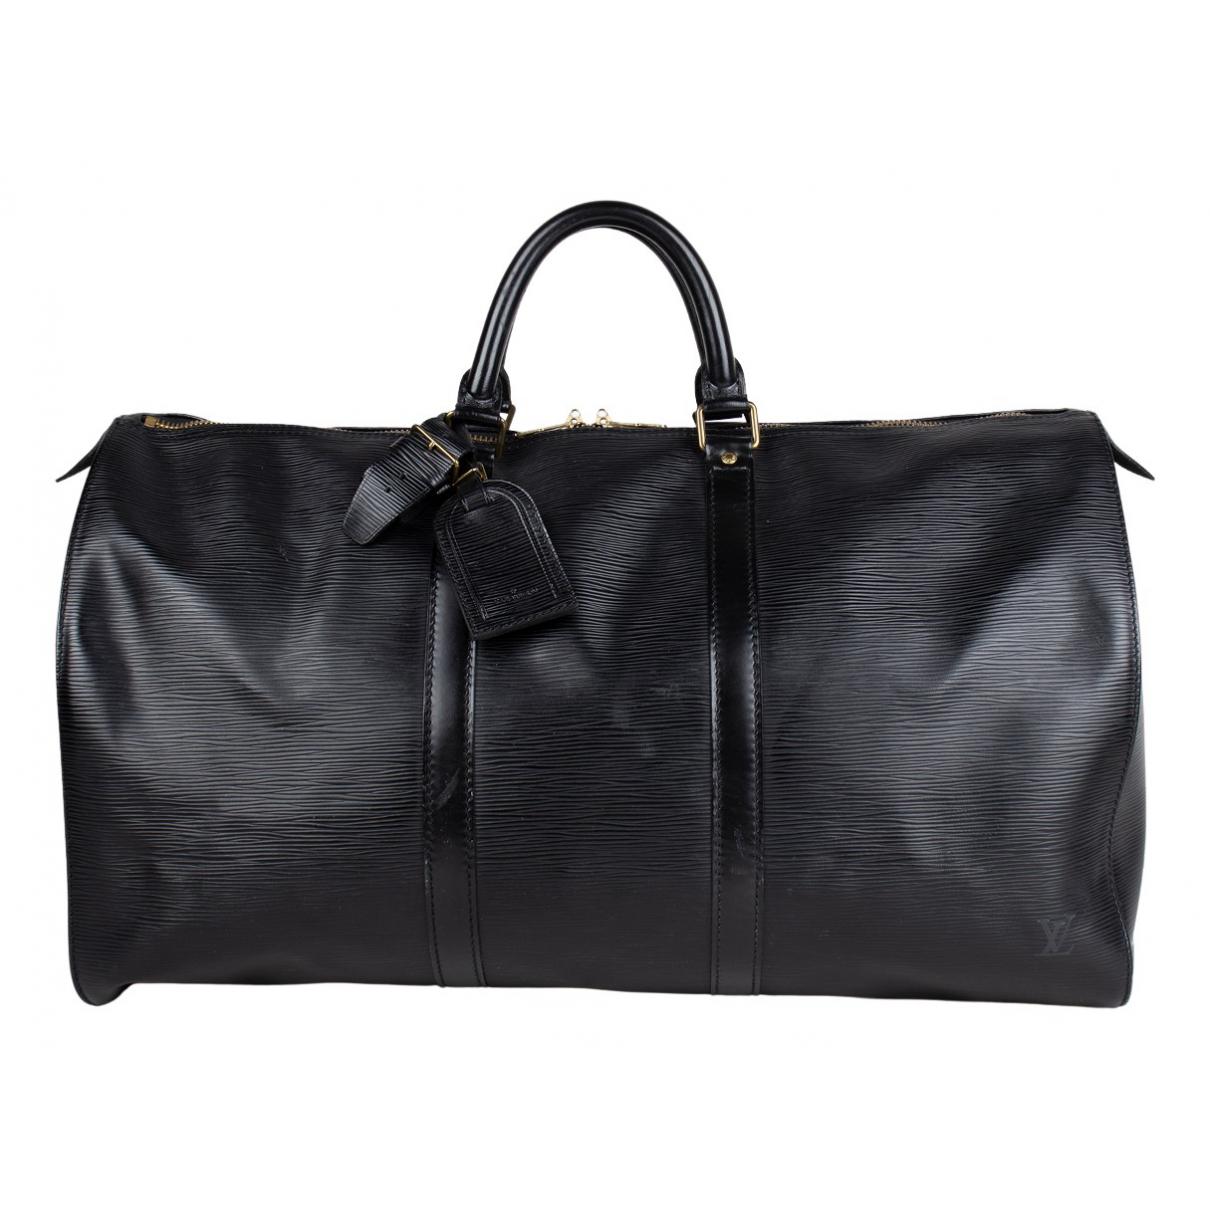 Bolso de viaje Keepall de Cuero Louis Vuitton